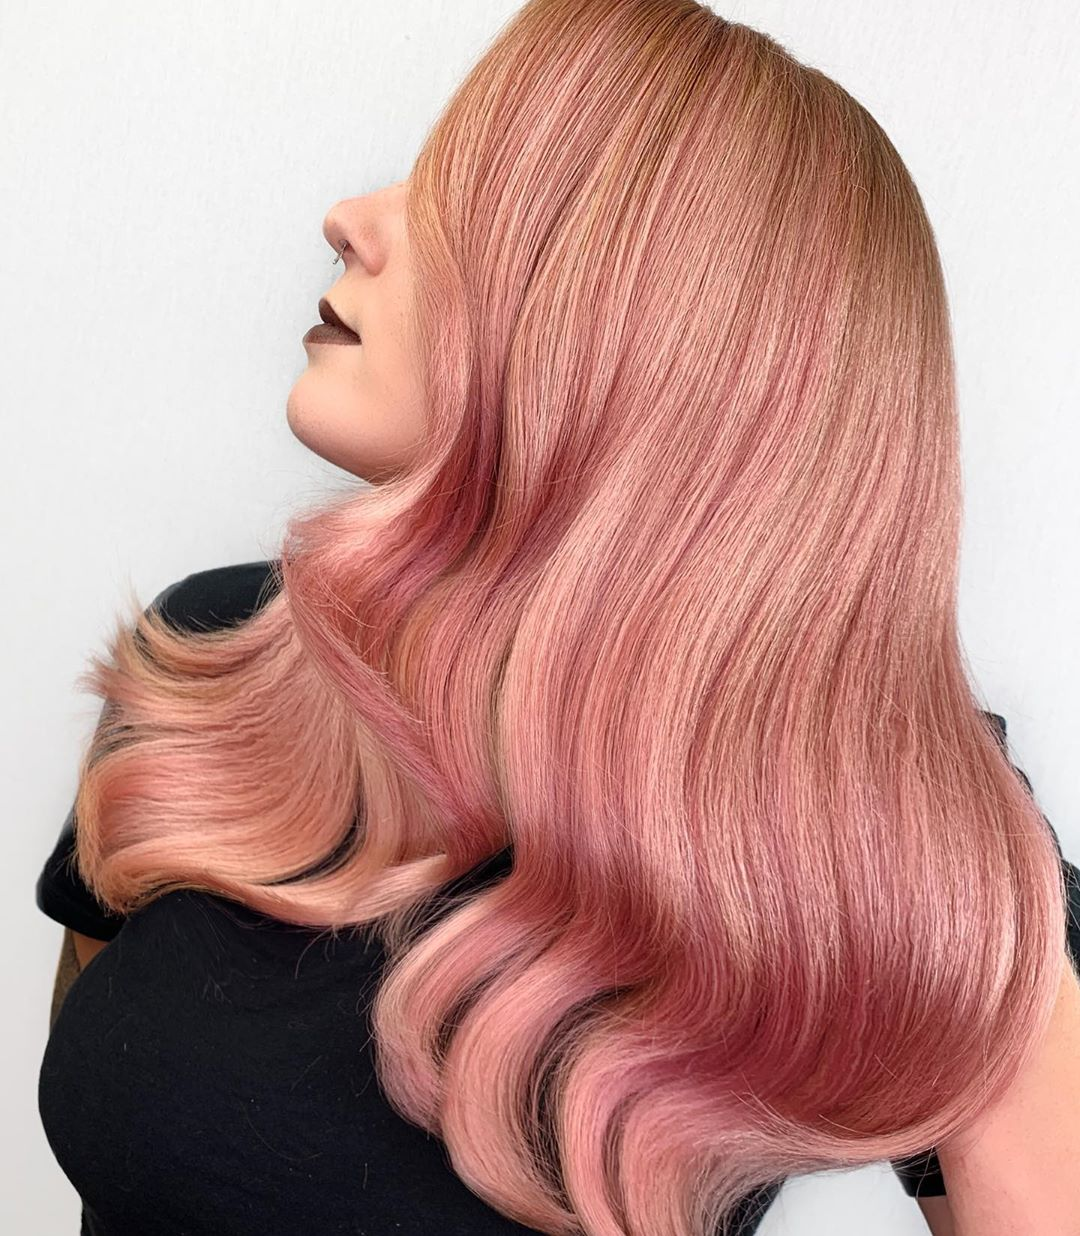 Rose Gold Highlights for Blonde Hair